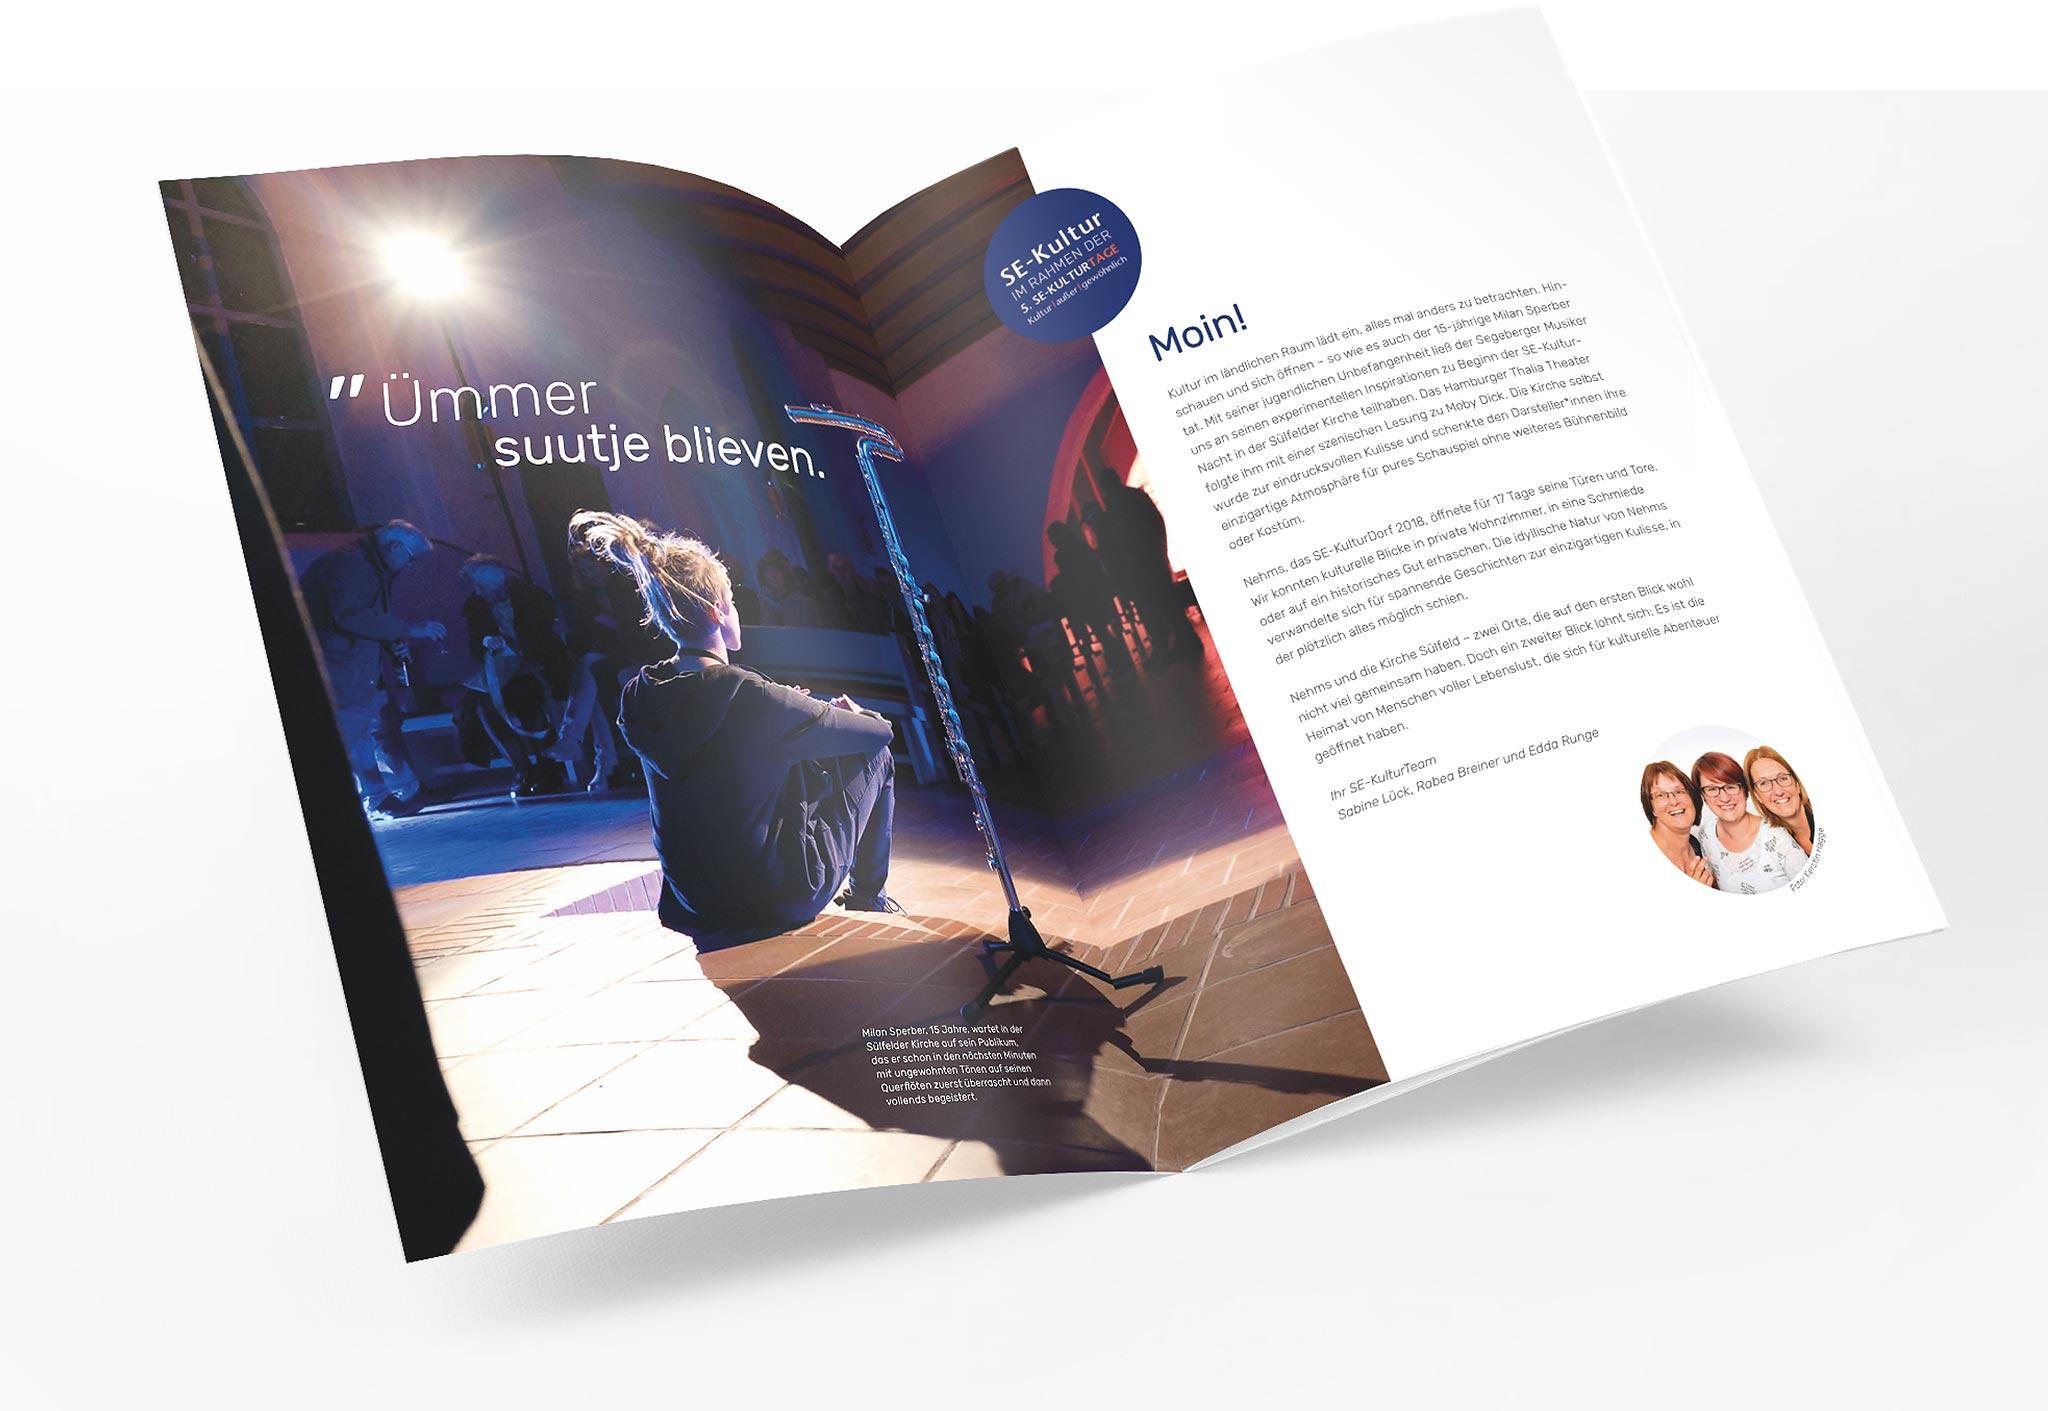 Fotografie, Editorial Design, Bildbearbeitung, Kultur, Kunst, Imagebroschüre, Segeberg